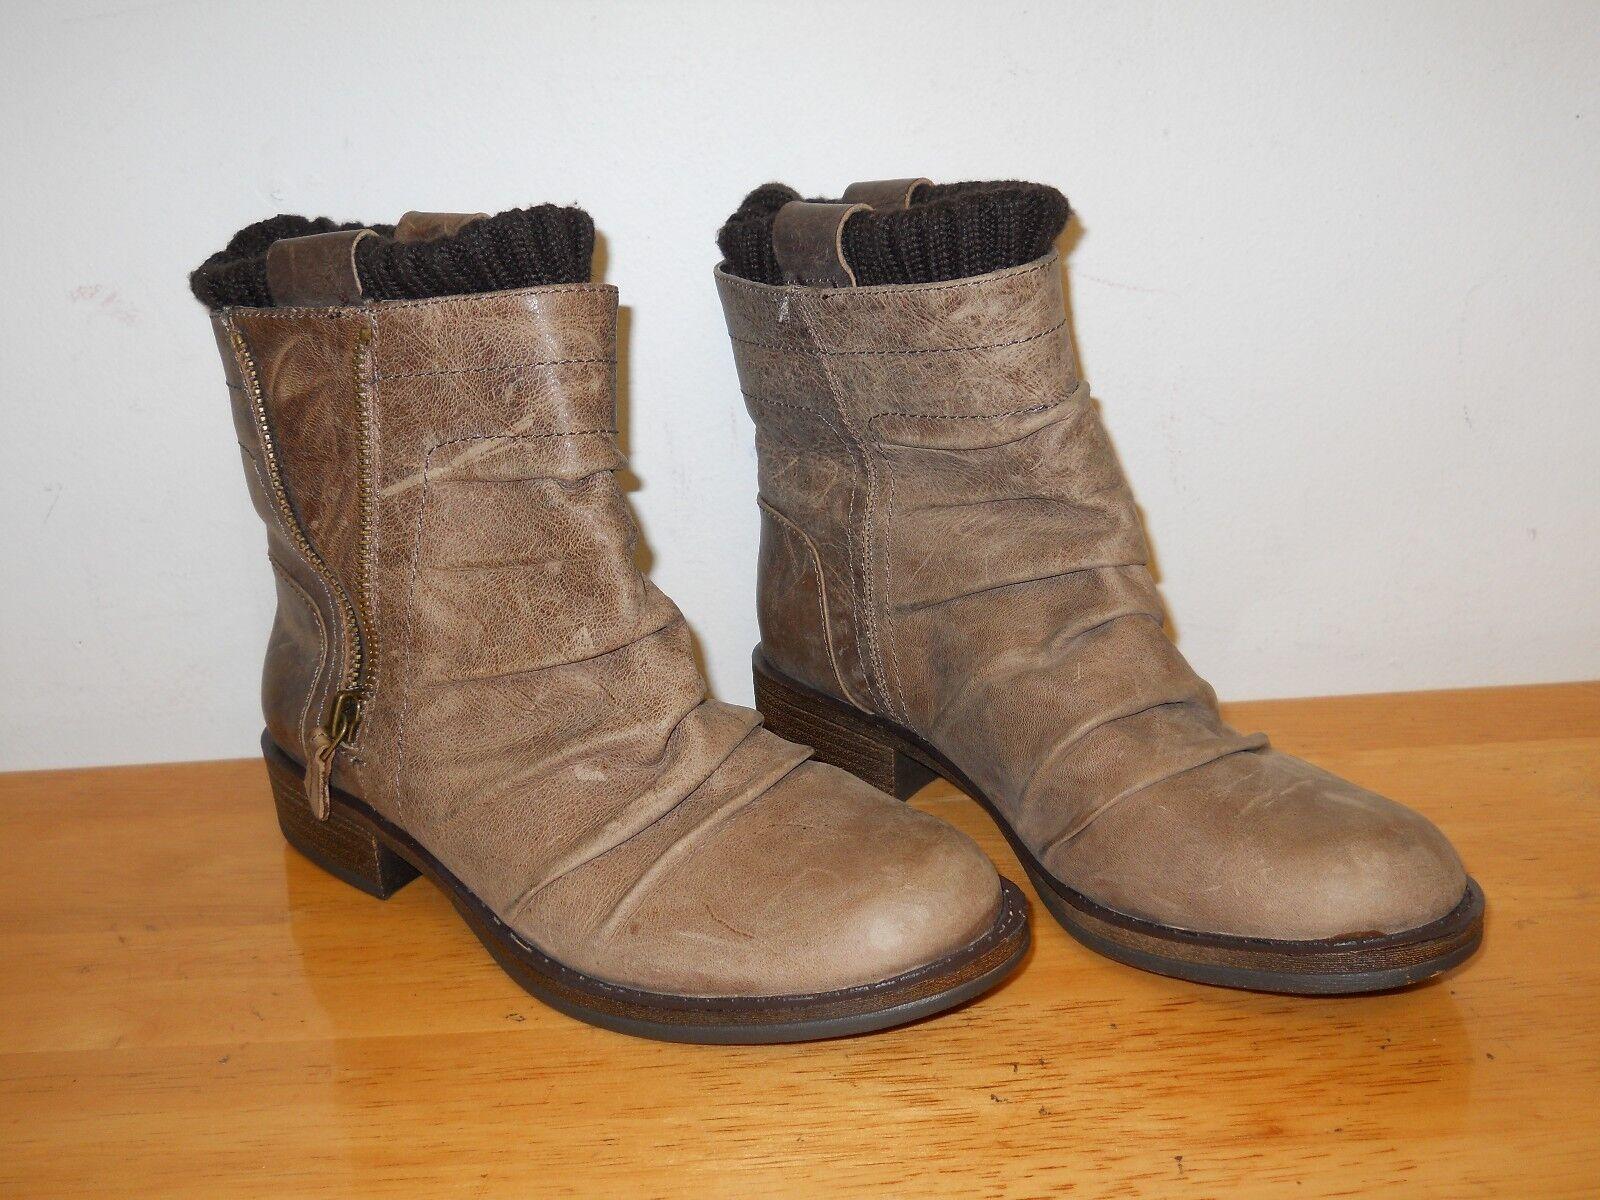 Gianni Bini New femmes Light marron Ankle bottes 6 M chaussures NWOB